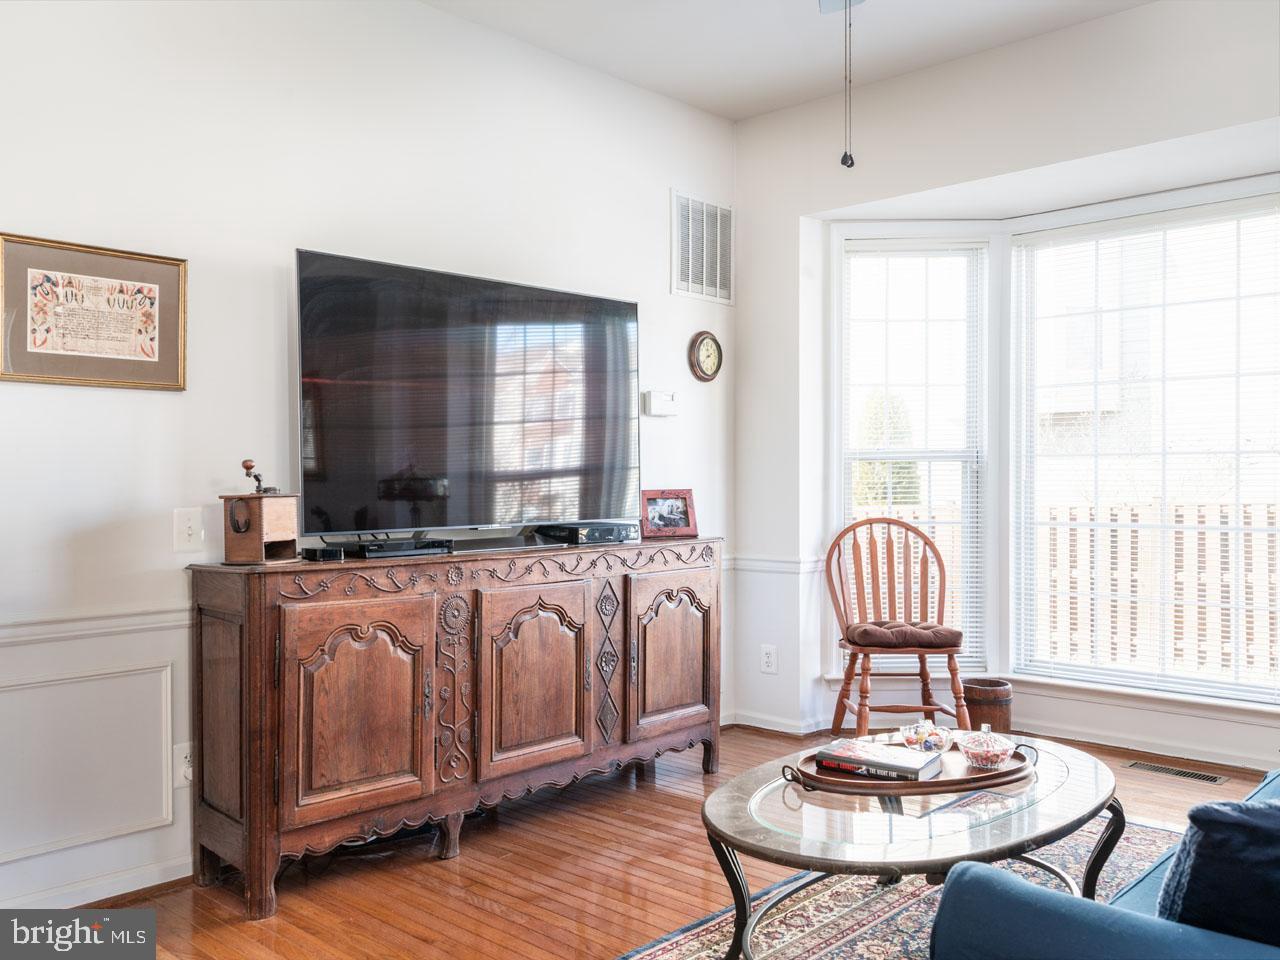 VAFX1104336-302201656777-2021-07-16-19-45-23  |   | Alexandria Delaware Real Estate For Sale | MLS# Vafx1104336  - Best of Northern Virginia